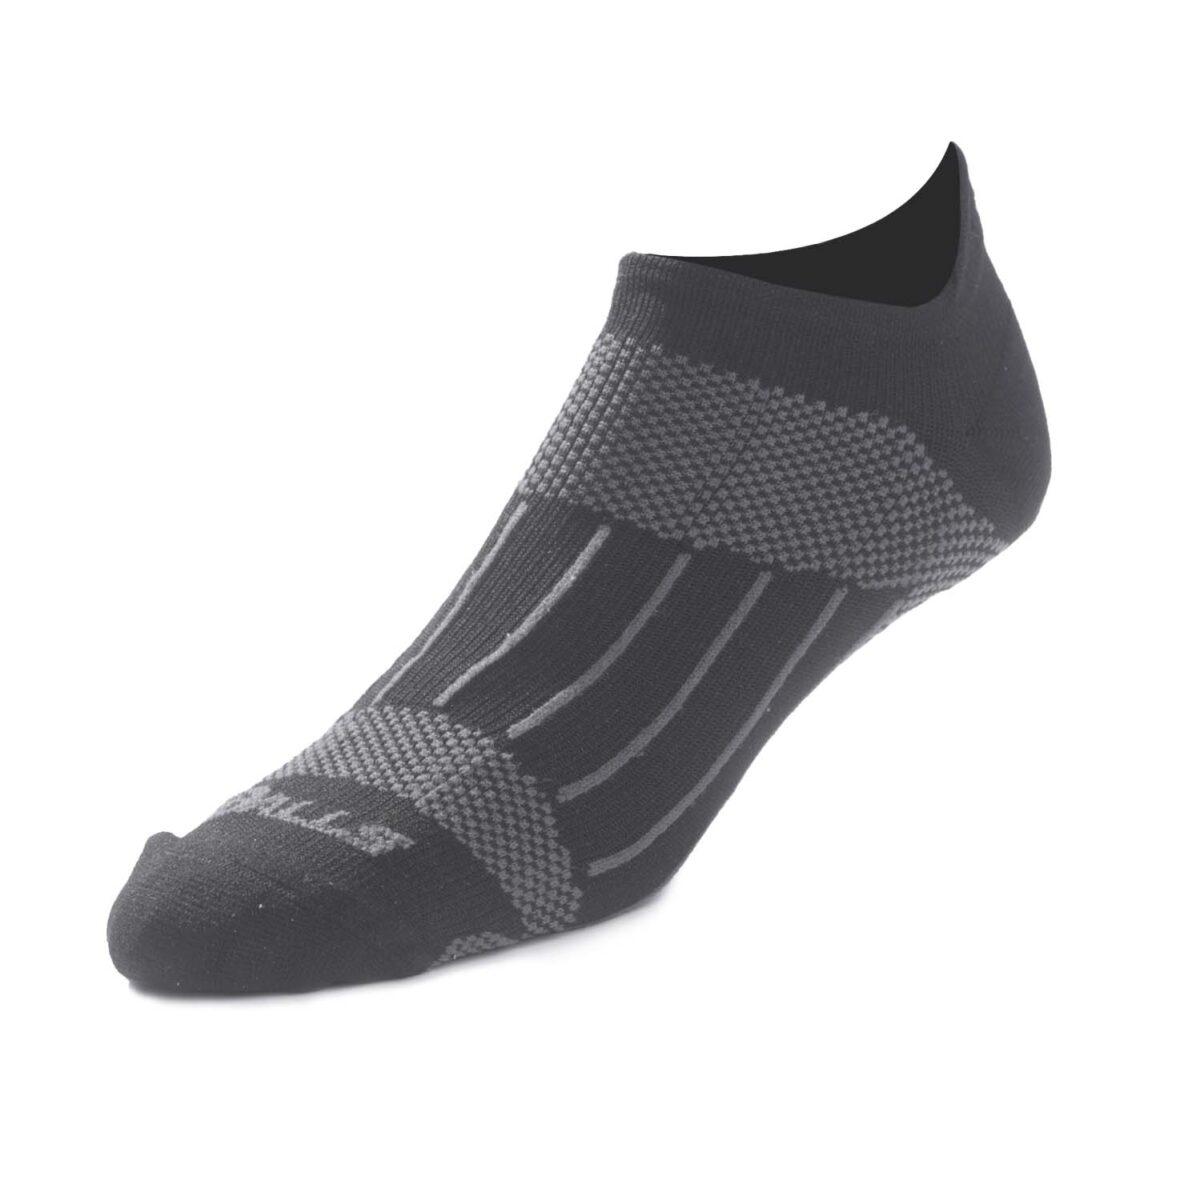 GALLS Performance Compression Low Cut Socks (Item #FT2678)